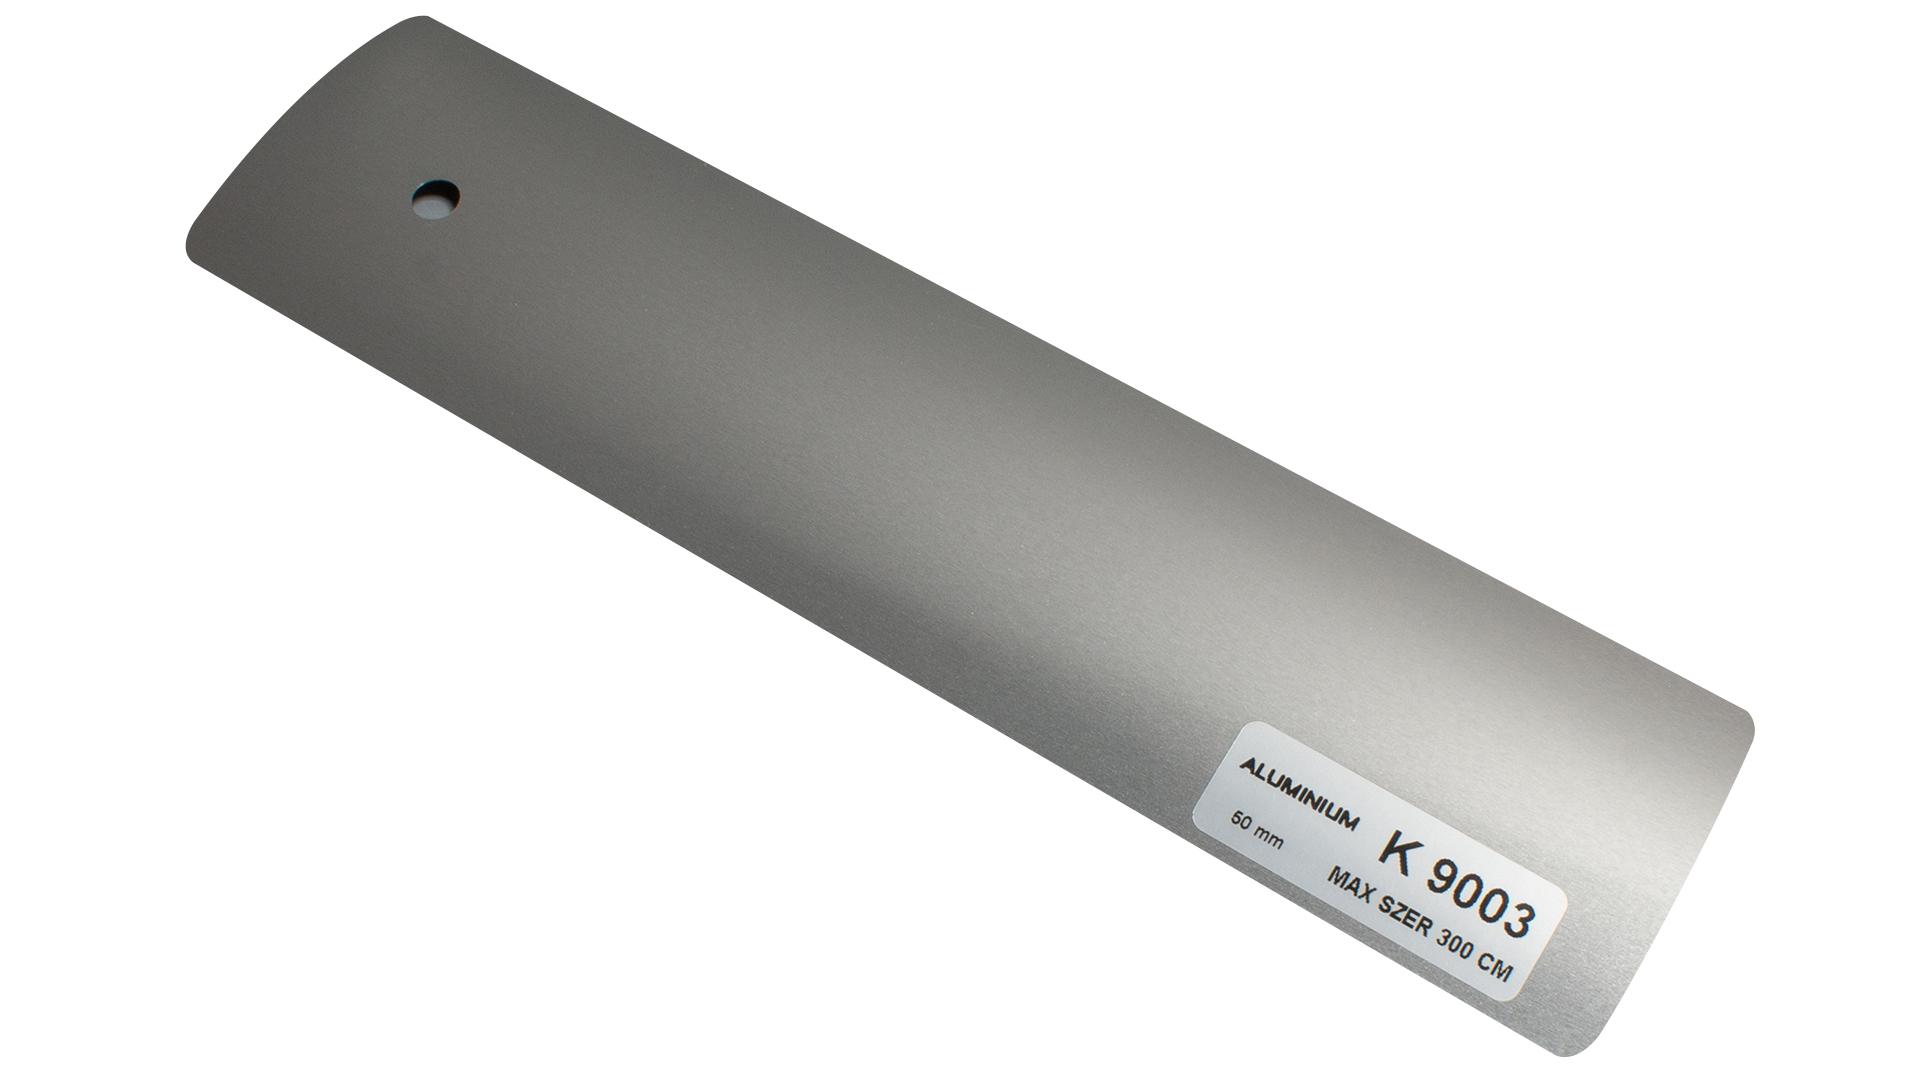 K9003